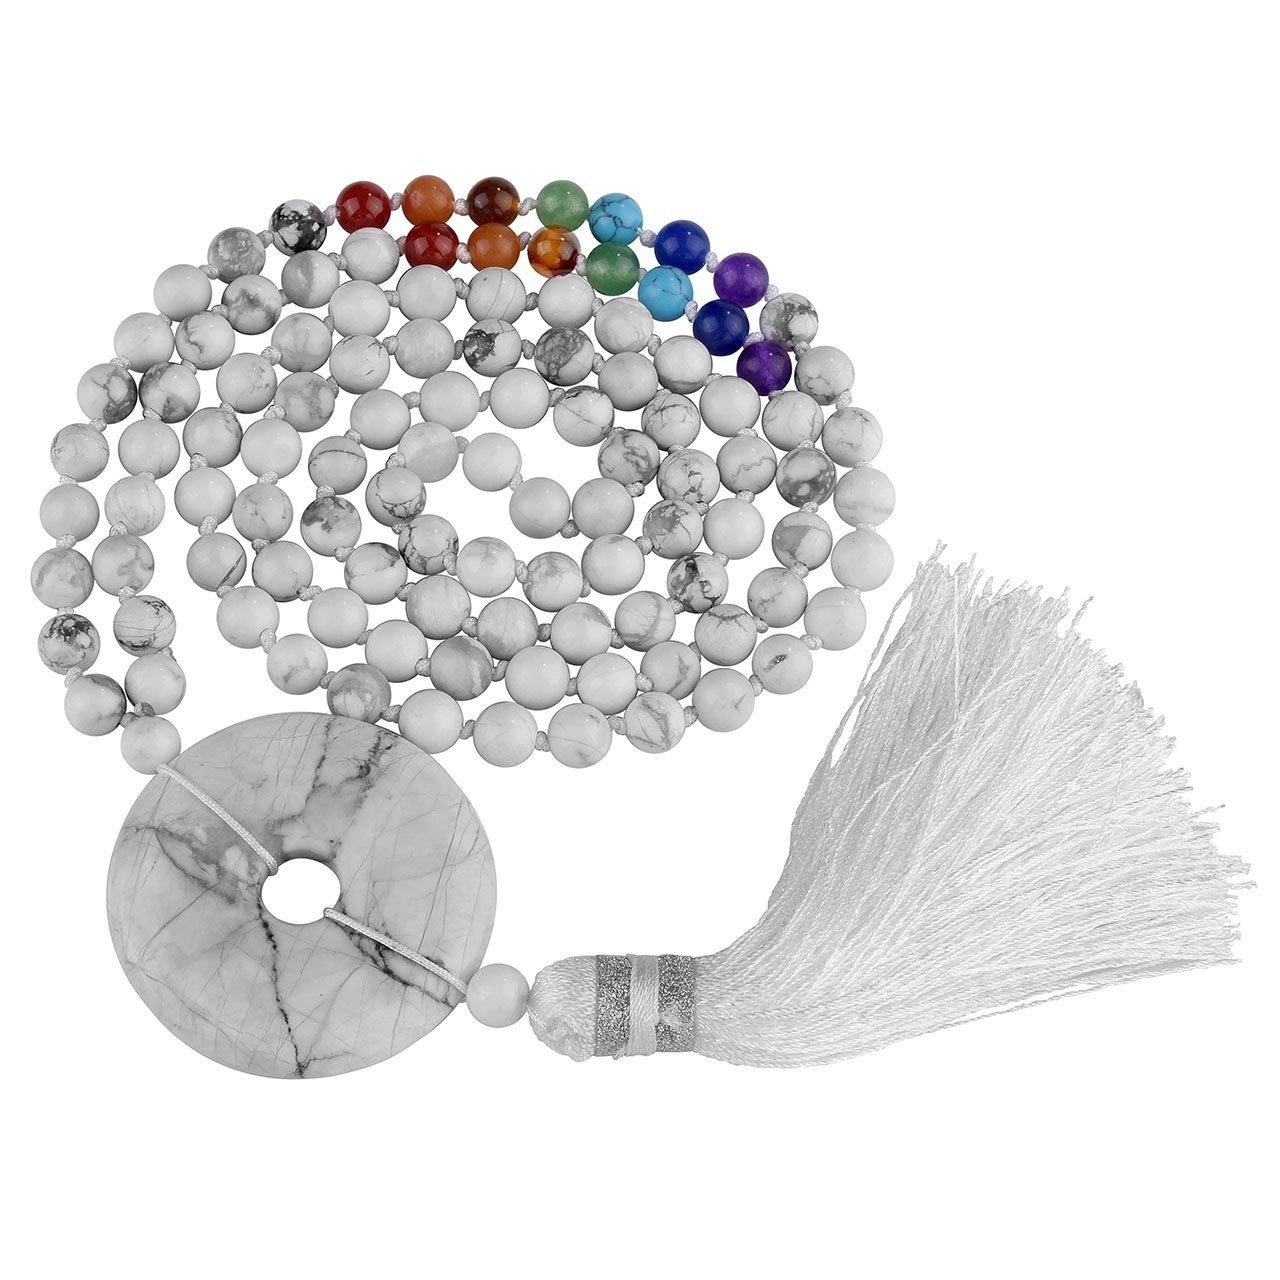 Top Plaza 7 Chakra Buddhist Mala Prayer Beads 108 Meditation Multilayer Healing Gemstone Bracelet/Necklace W/Tassel Protective Charm(White Howlite)